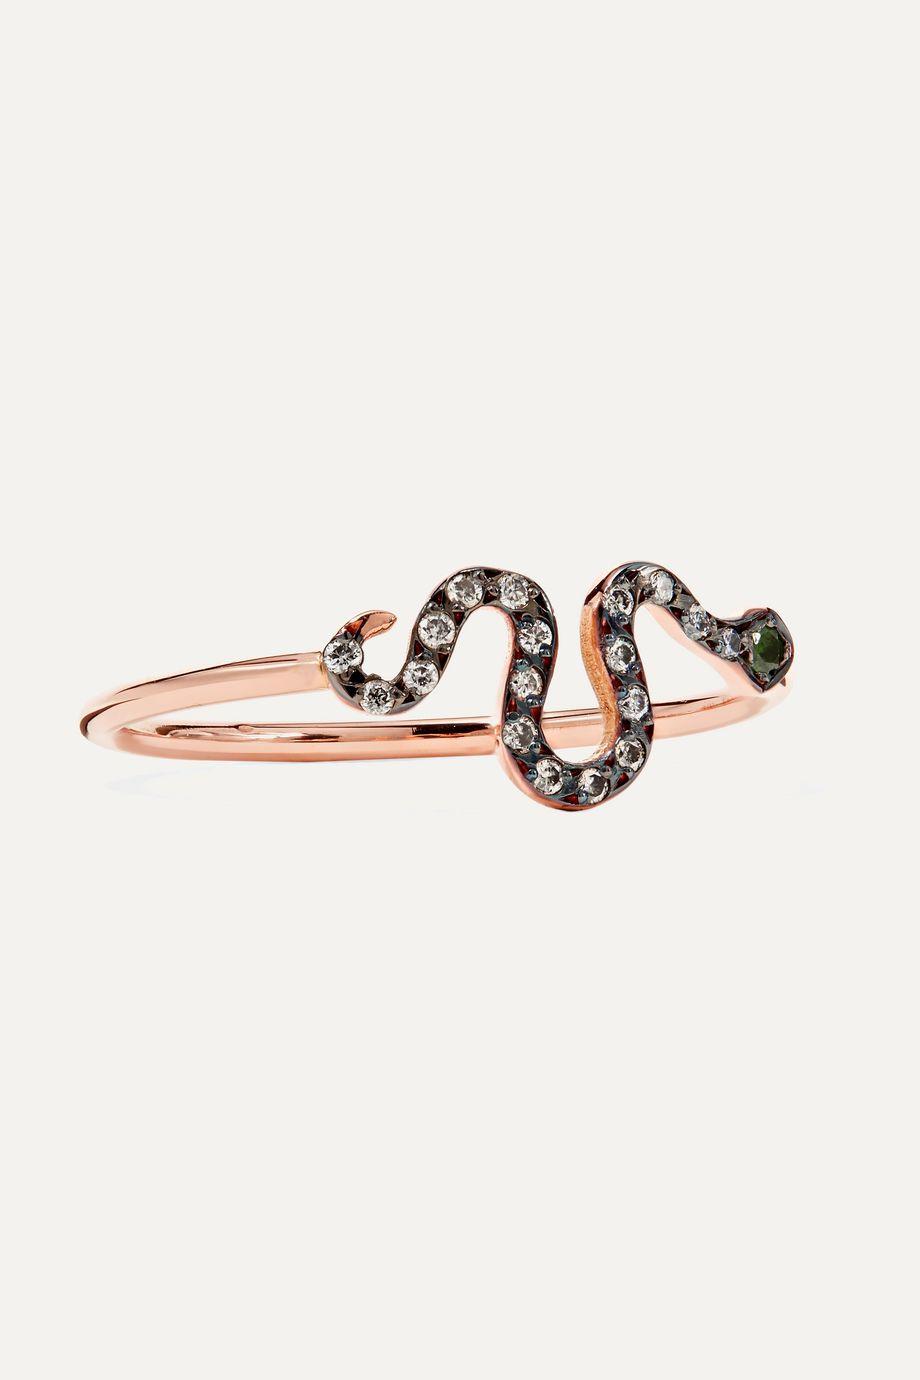 Ileana Makri Mini Snake 18-karat rose gold, diamond and tsavorite ring